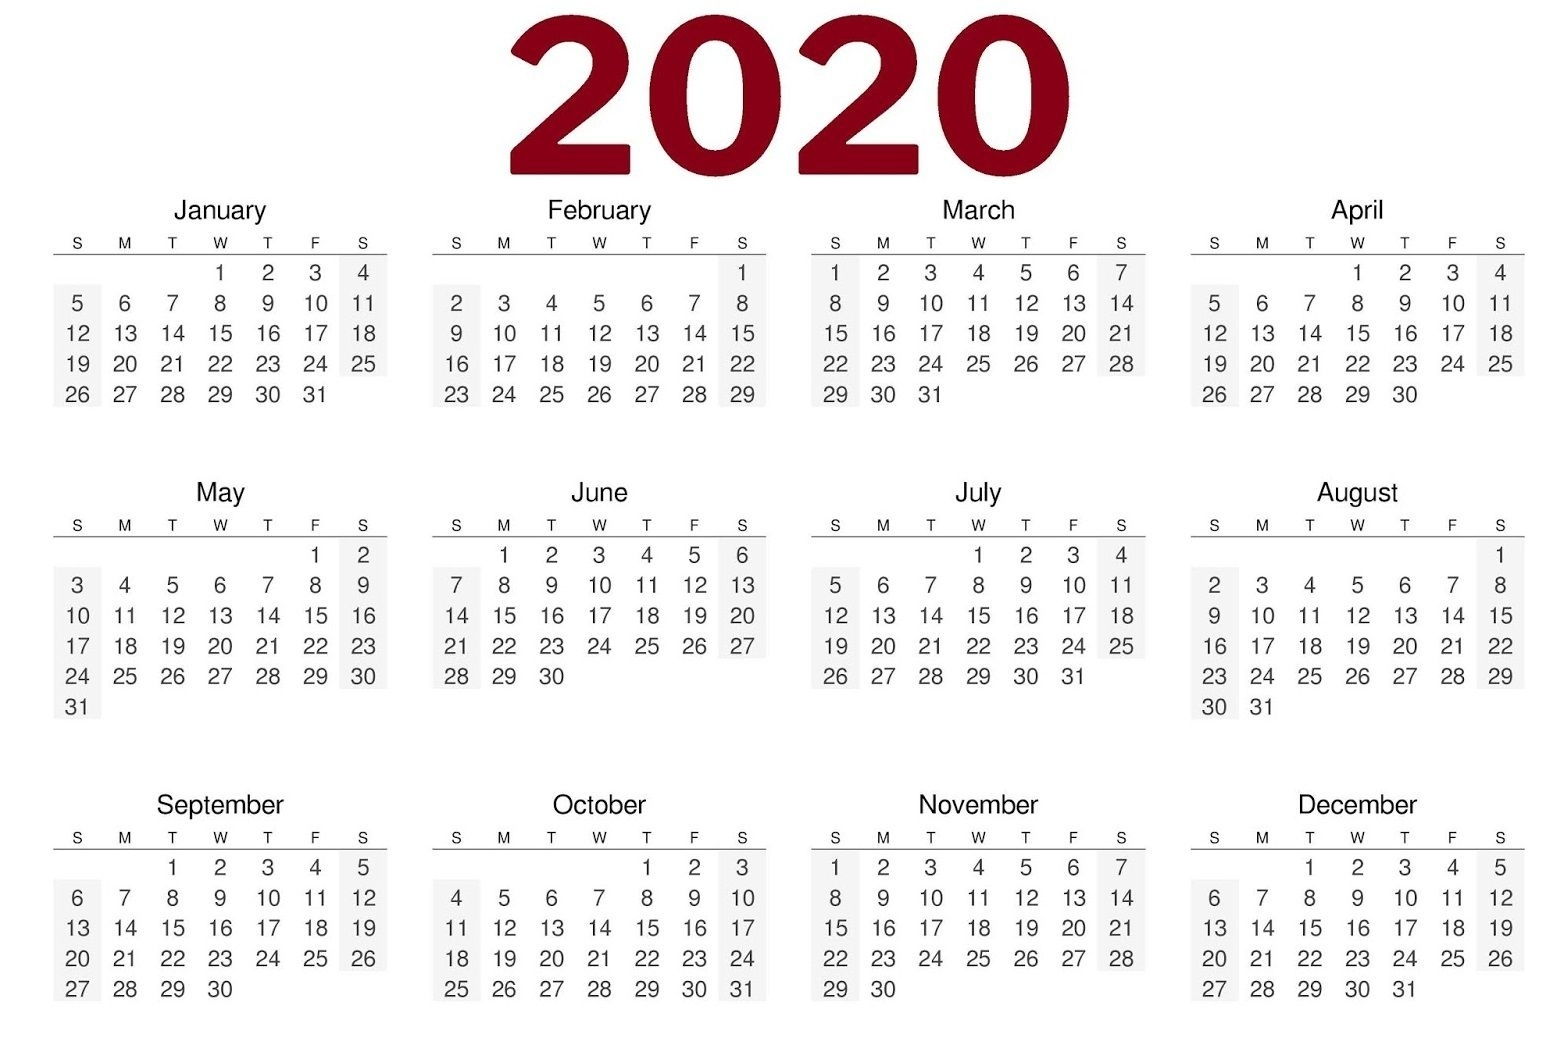 2020 One Page Landscape Calendar | 2020 Calendars | 2019